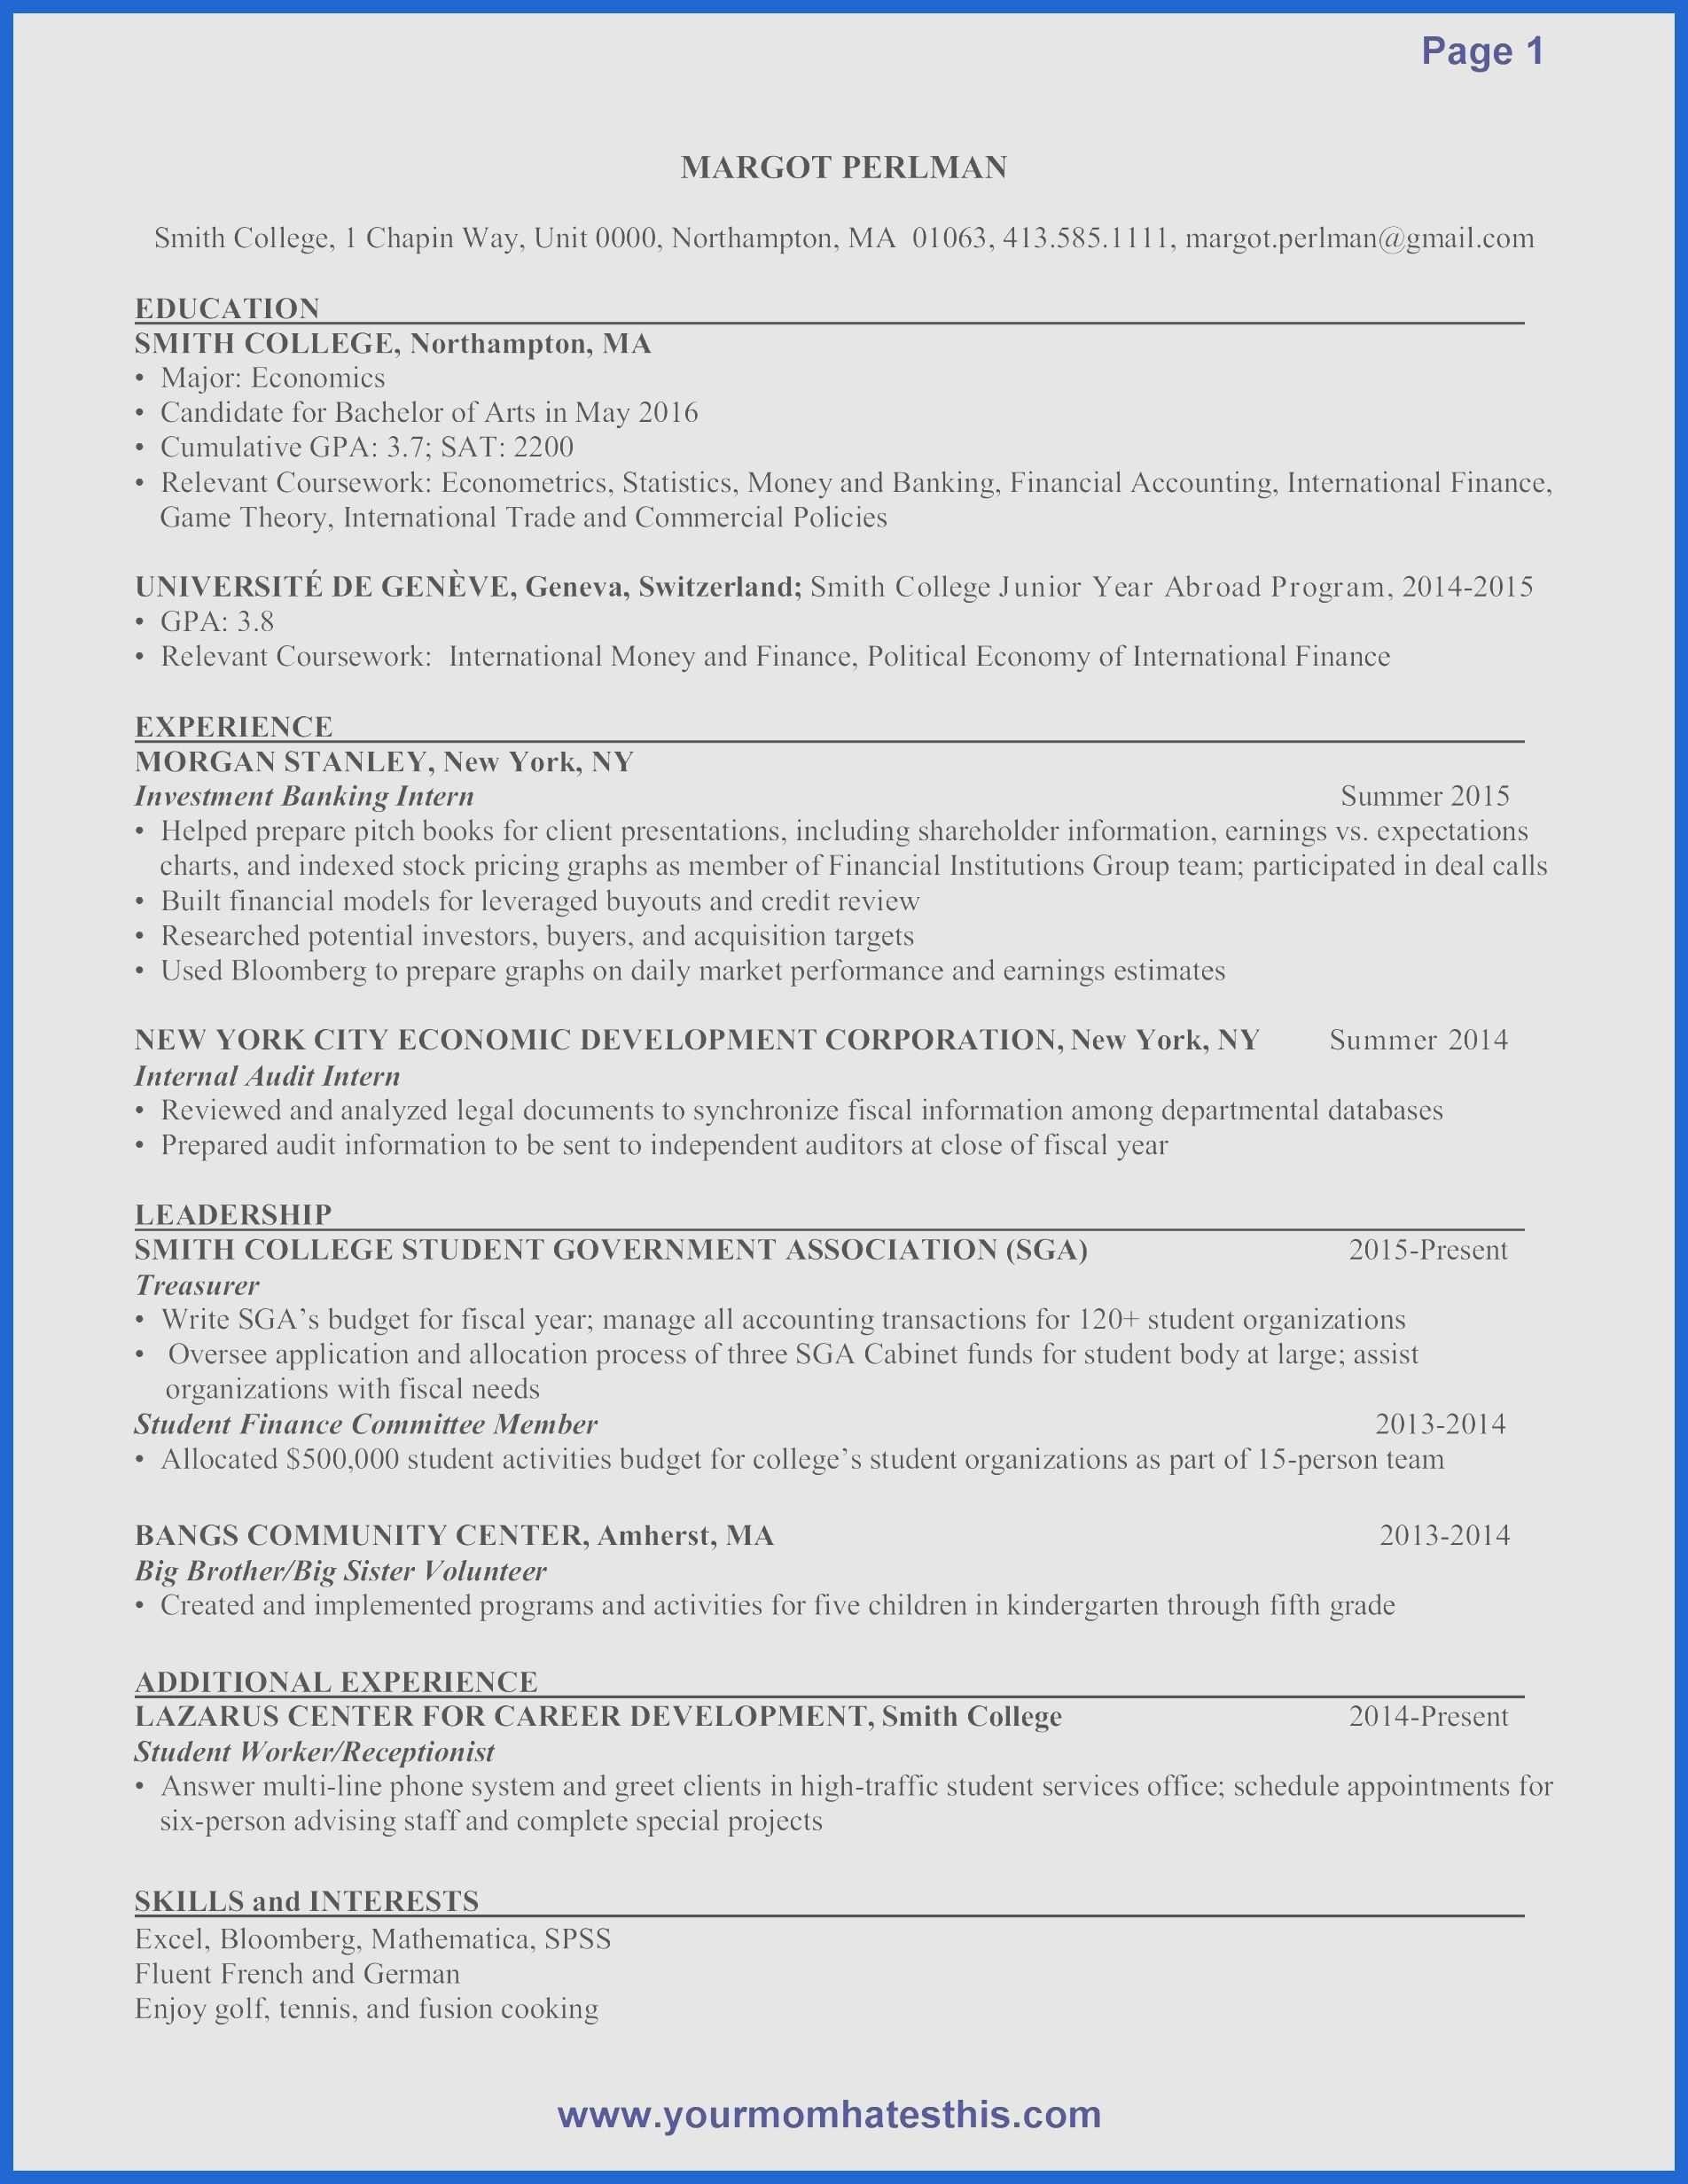 Cute Resume Templates Free Examples ¢Ë†Å¡ Resume Powerpoint Template Popular Resume Ppt Template Beautiful